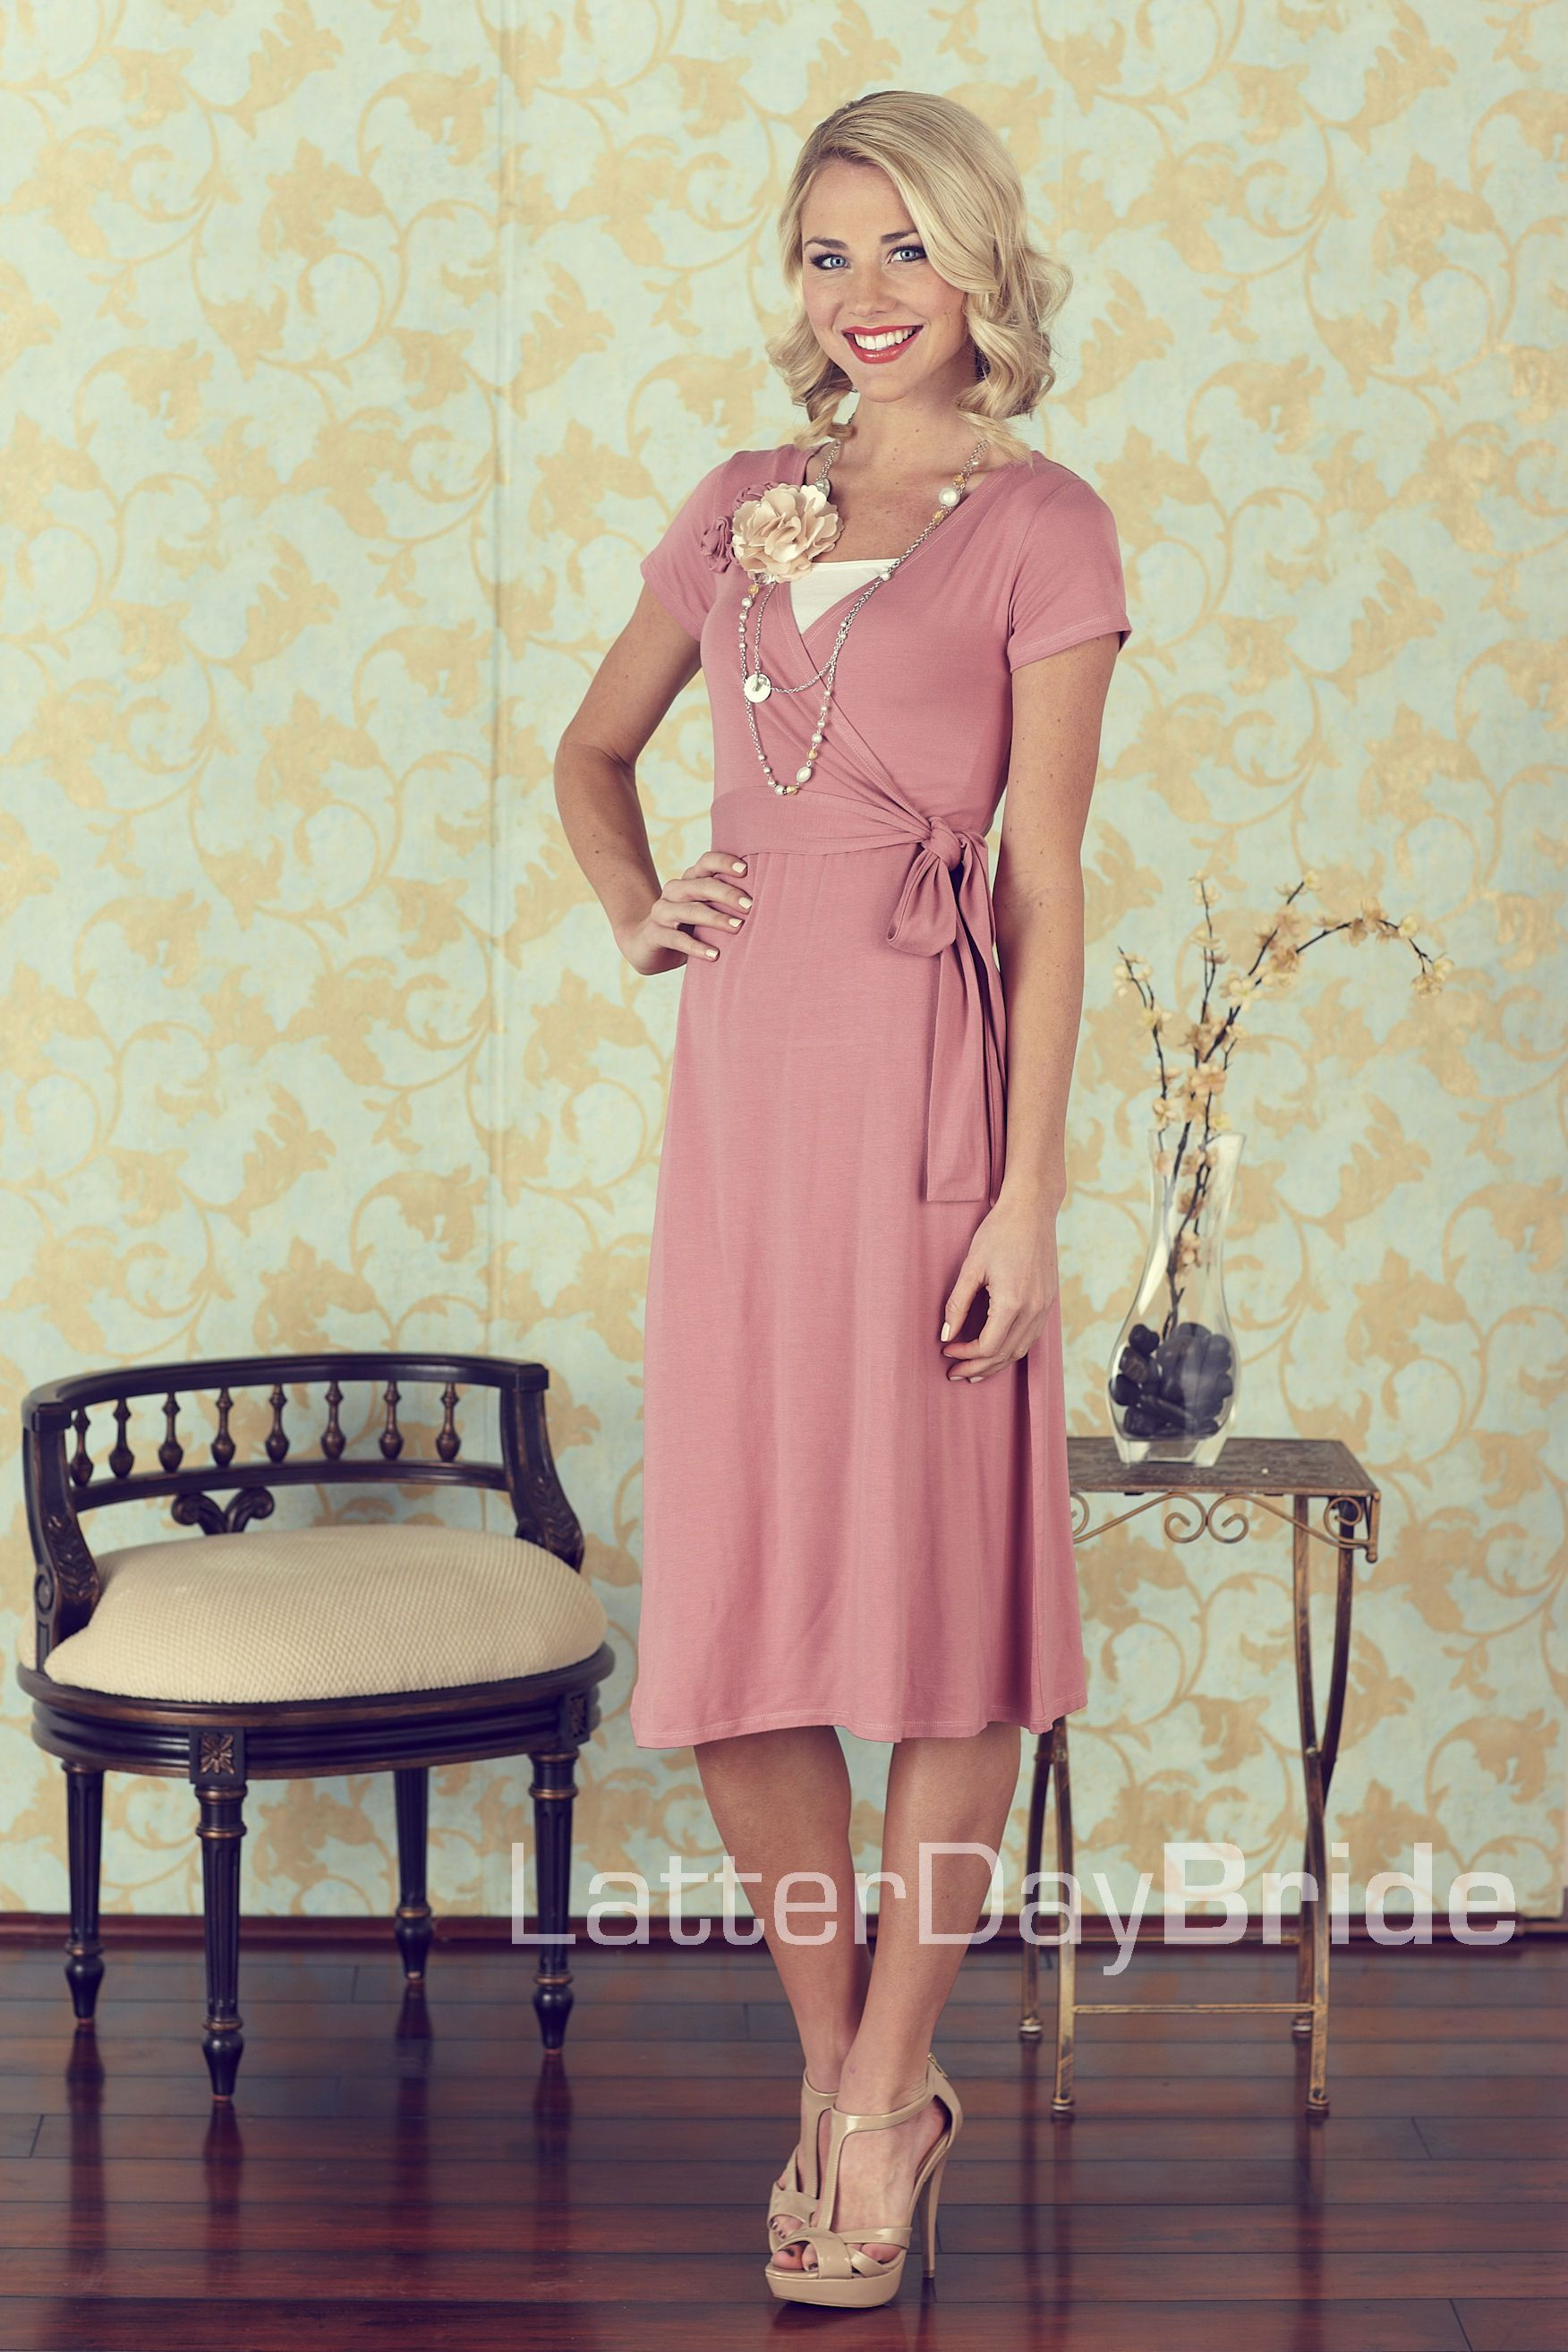 Modest Clothing, MR 7014   LatterDayBride & Prom Bridesmaid ...